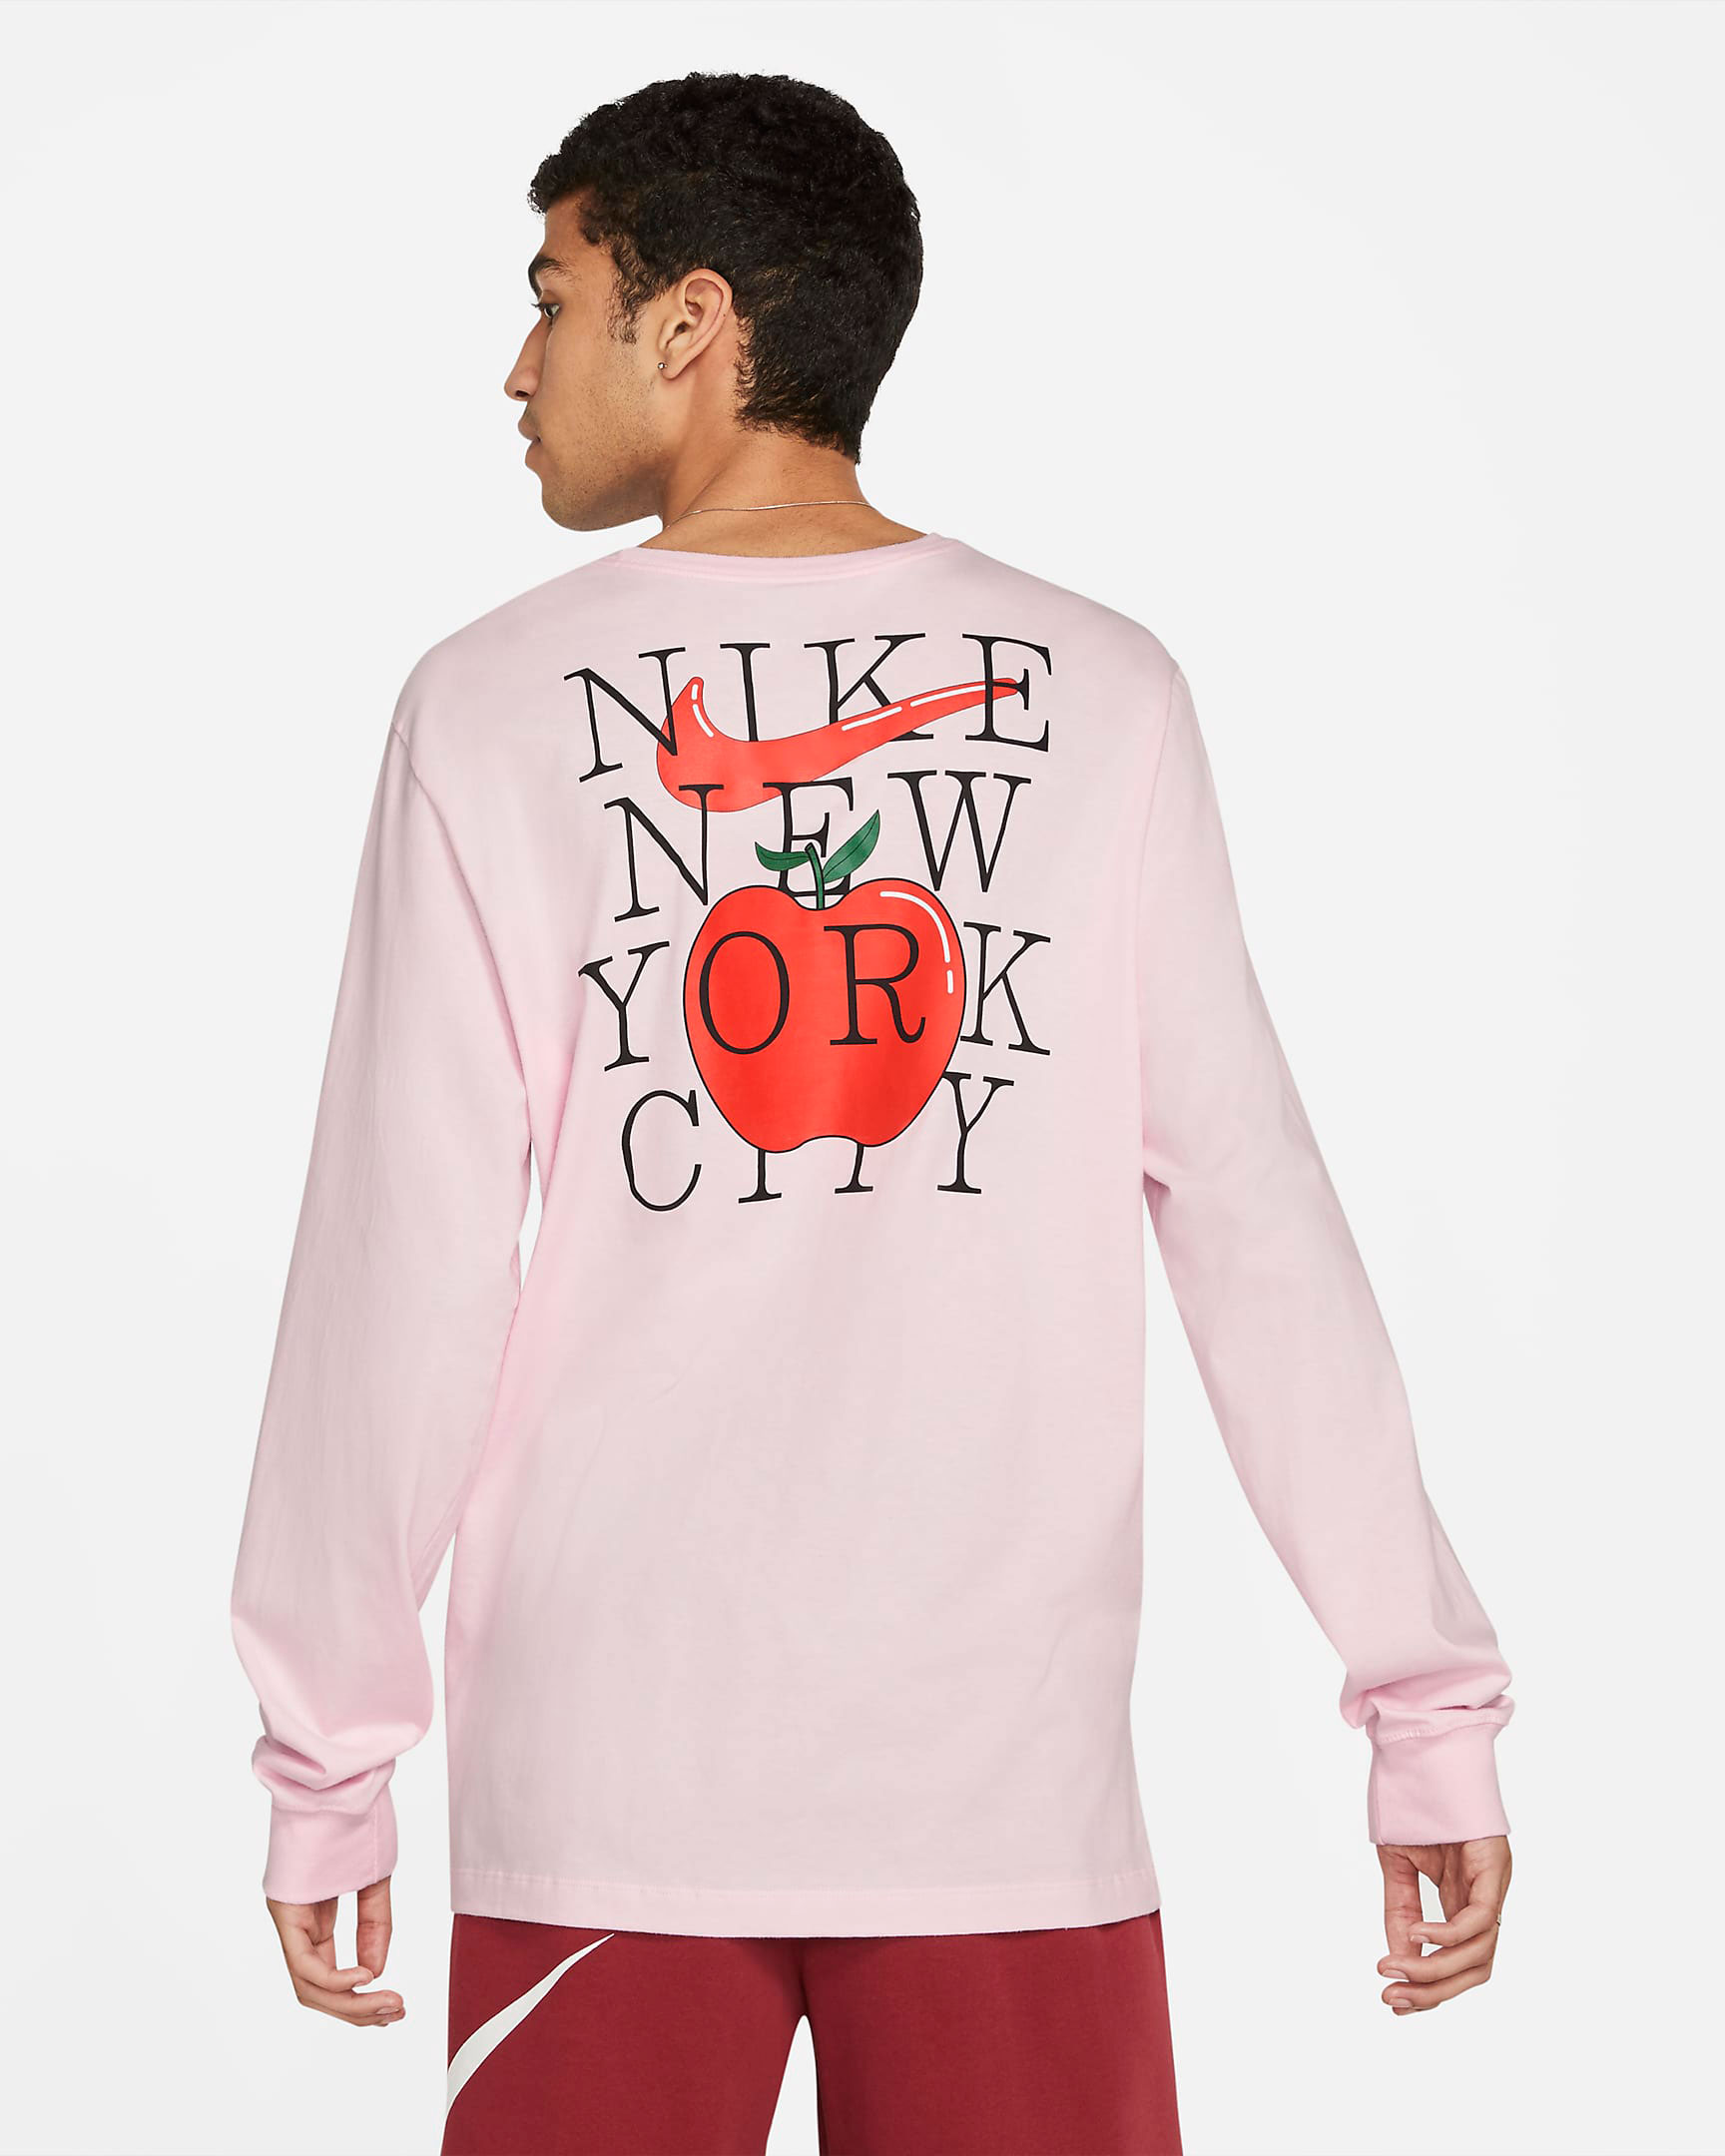 nike-nyc-pink-foam-shirt-2